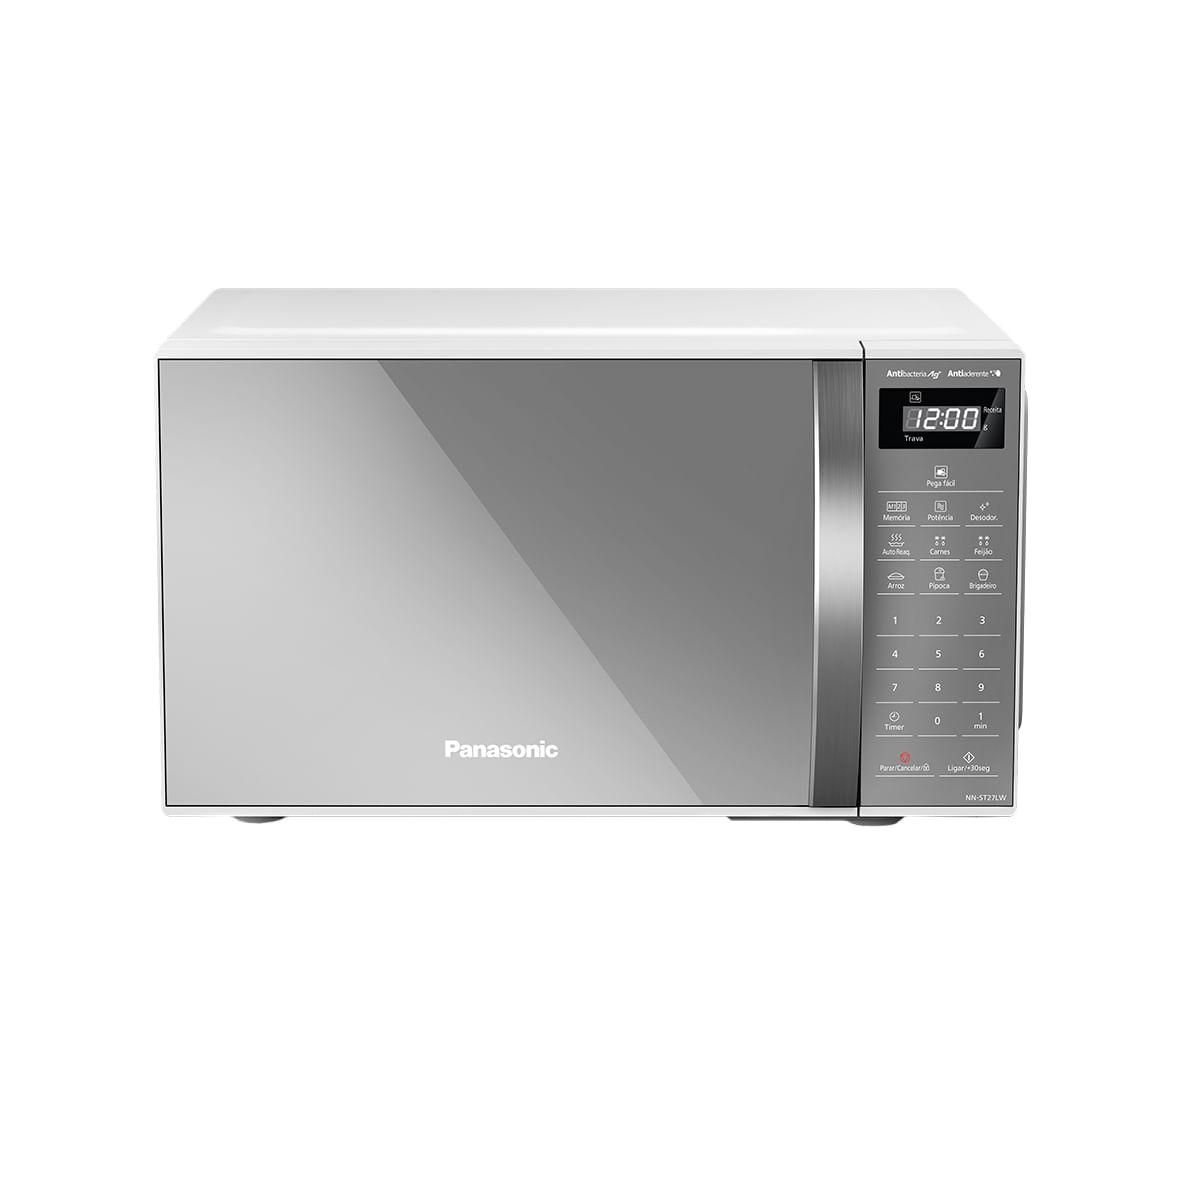 Imagem de Micro-ondas Panasonic 21 Litros Branco Espelhado - ST27LWRU